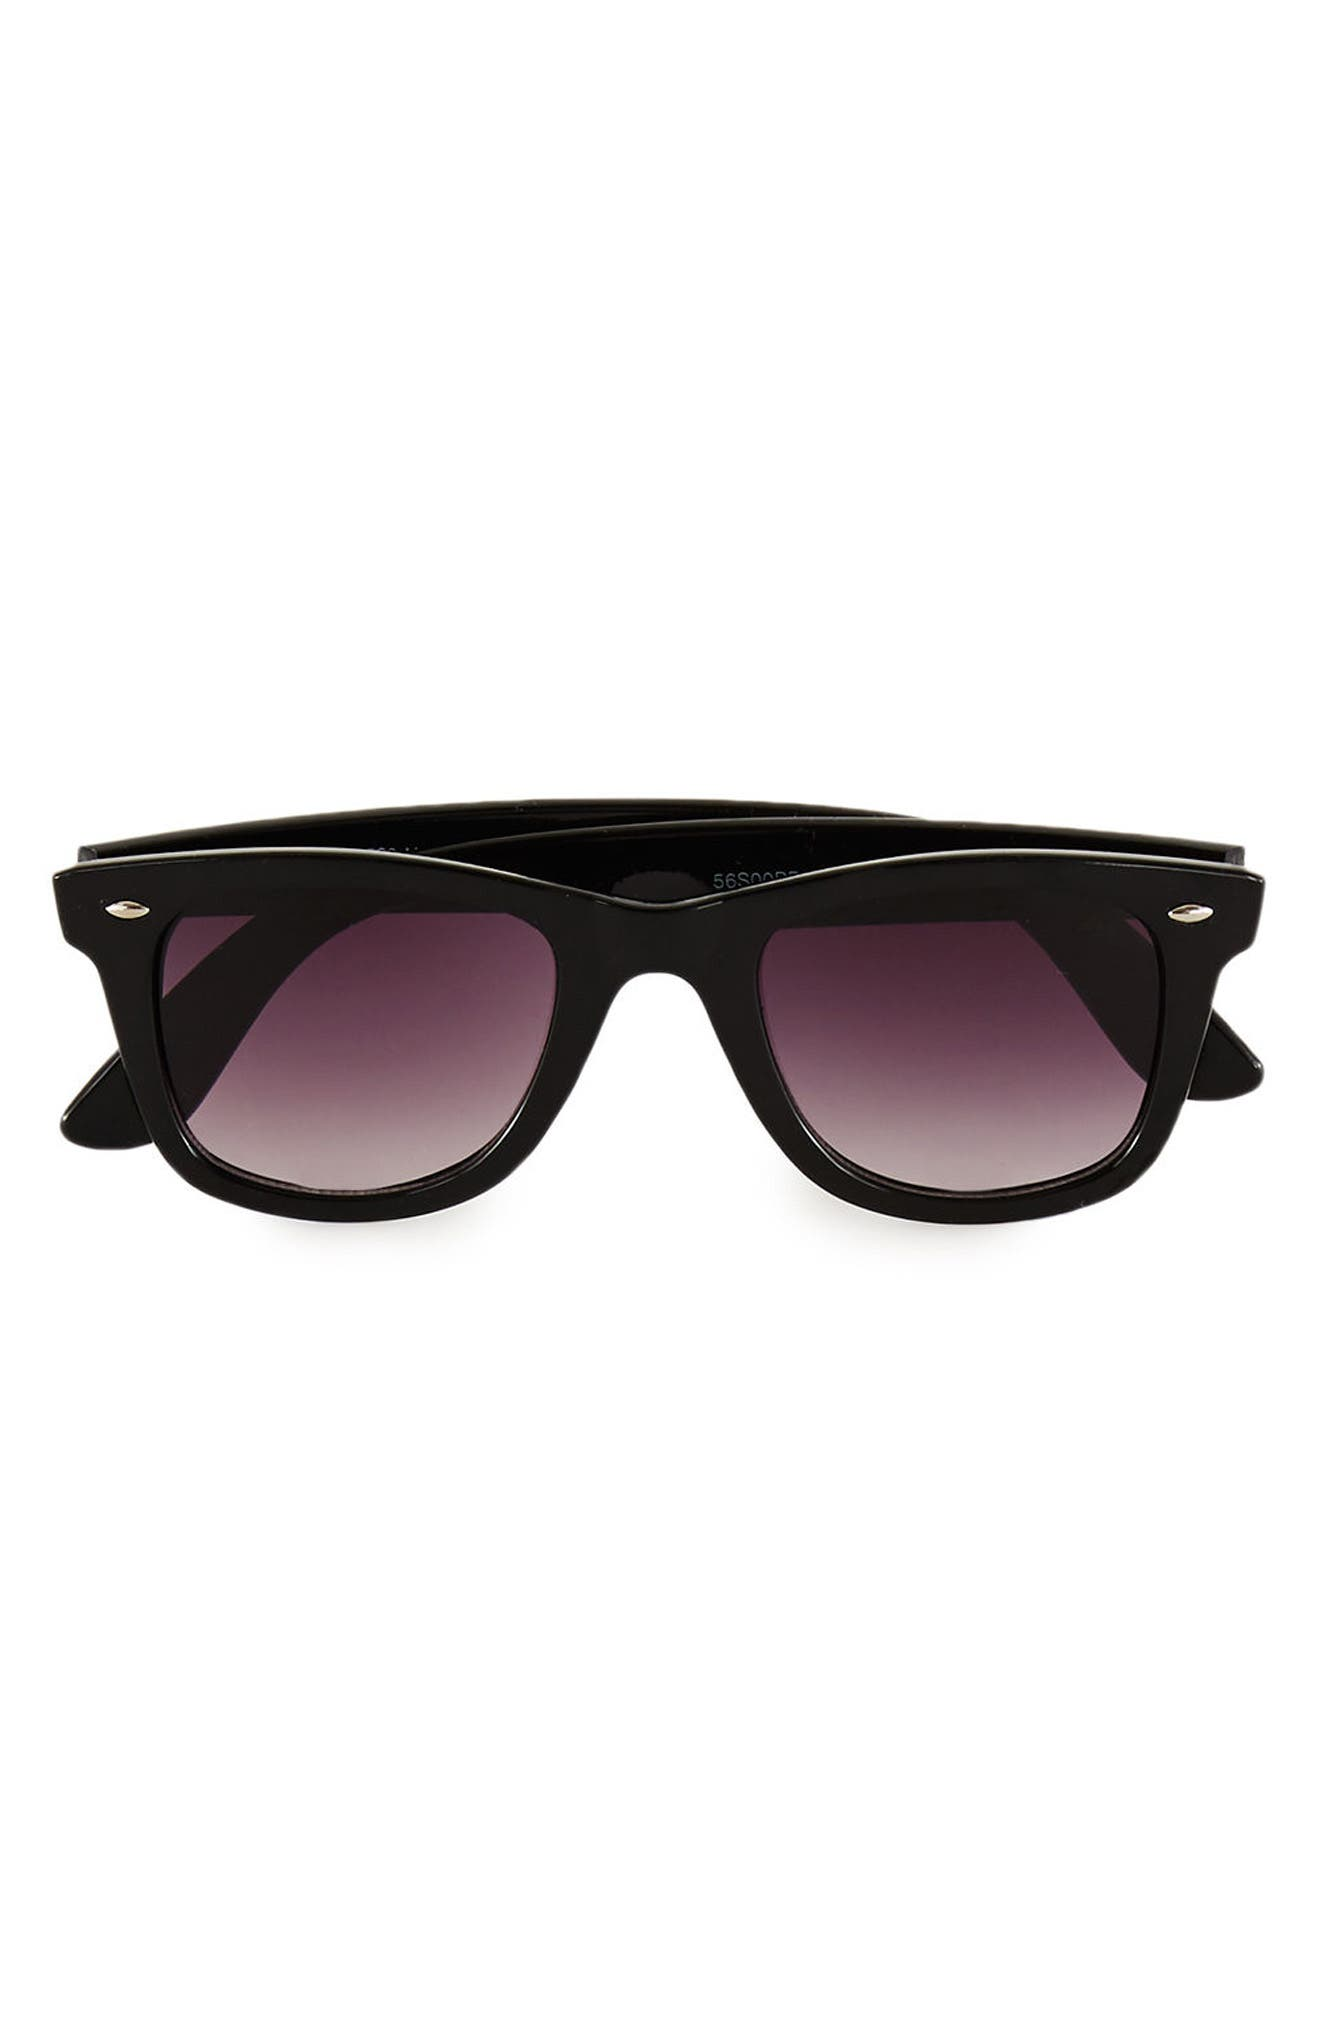 48mm Round Sunglasses,                             Main thumbnail 1, color,                             001